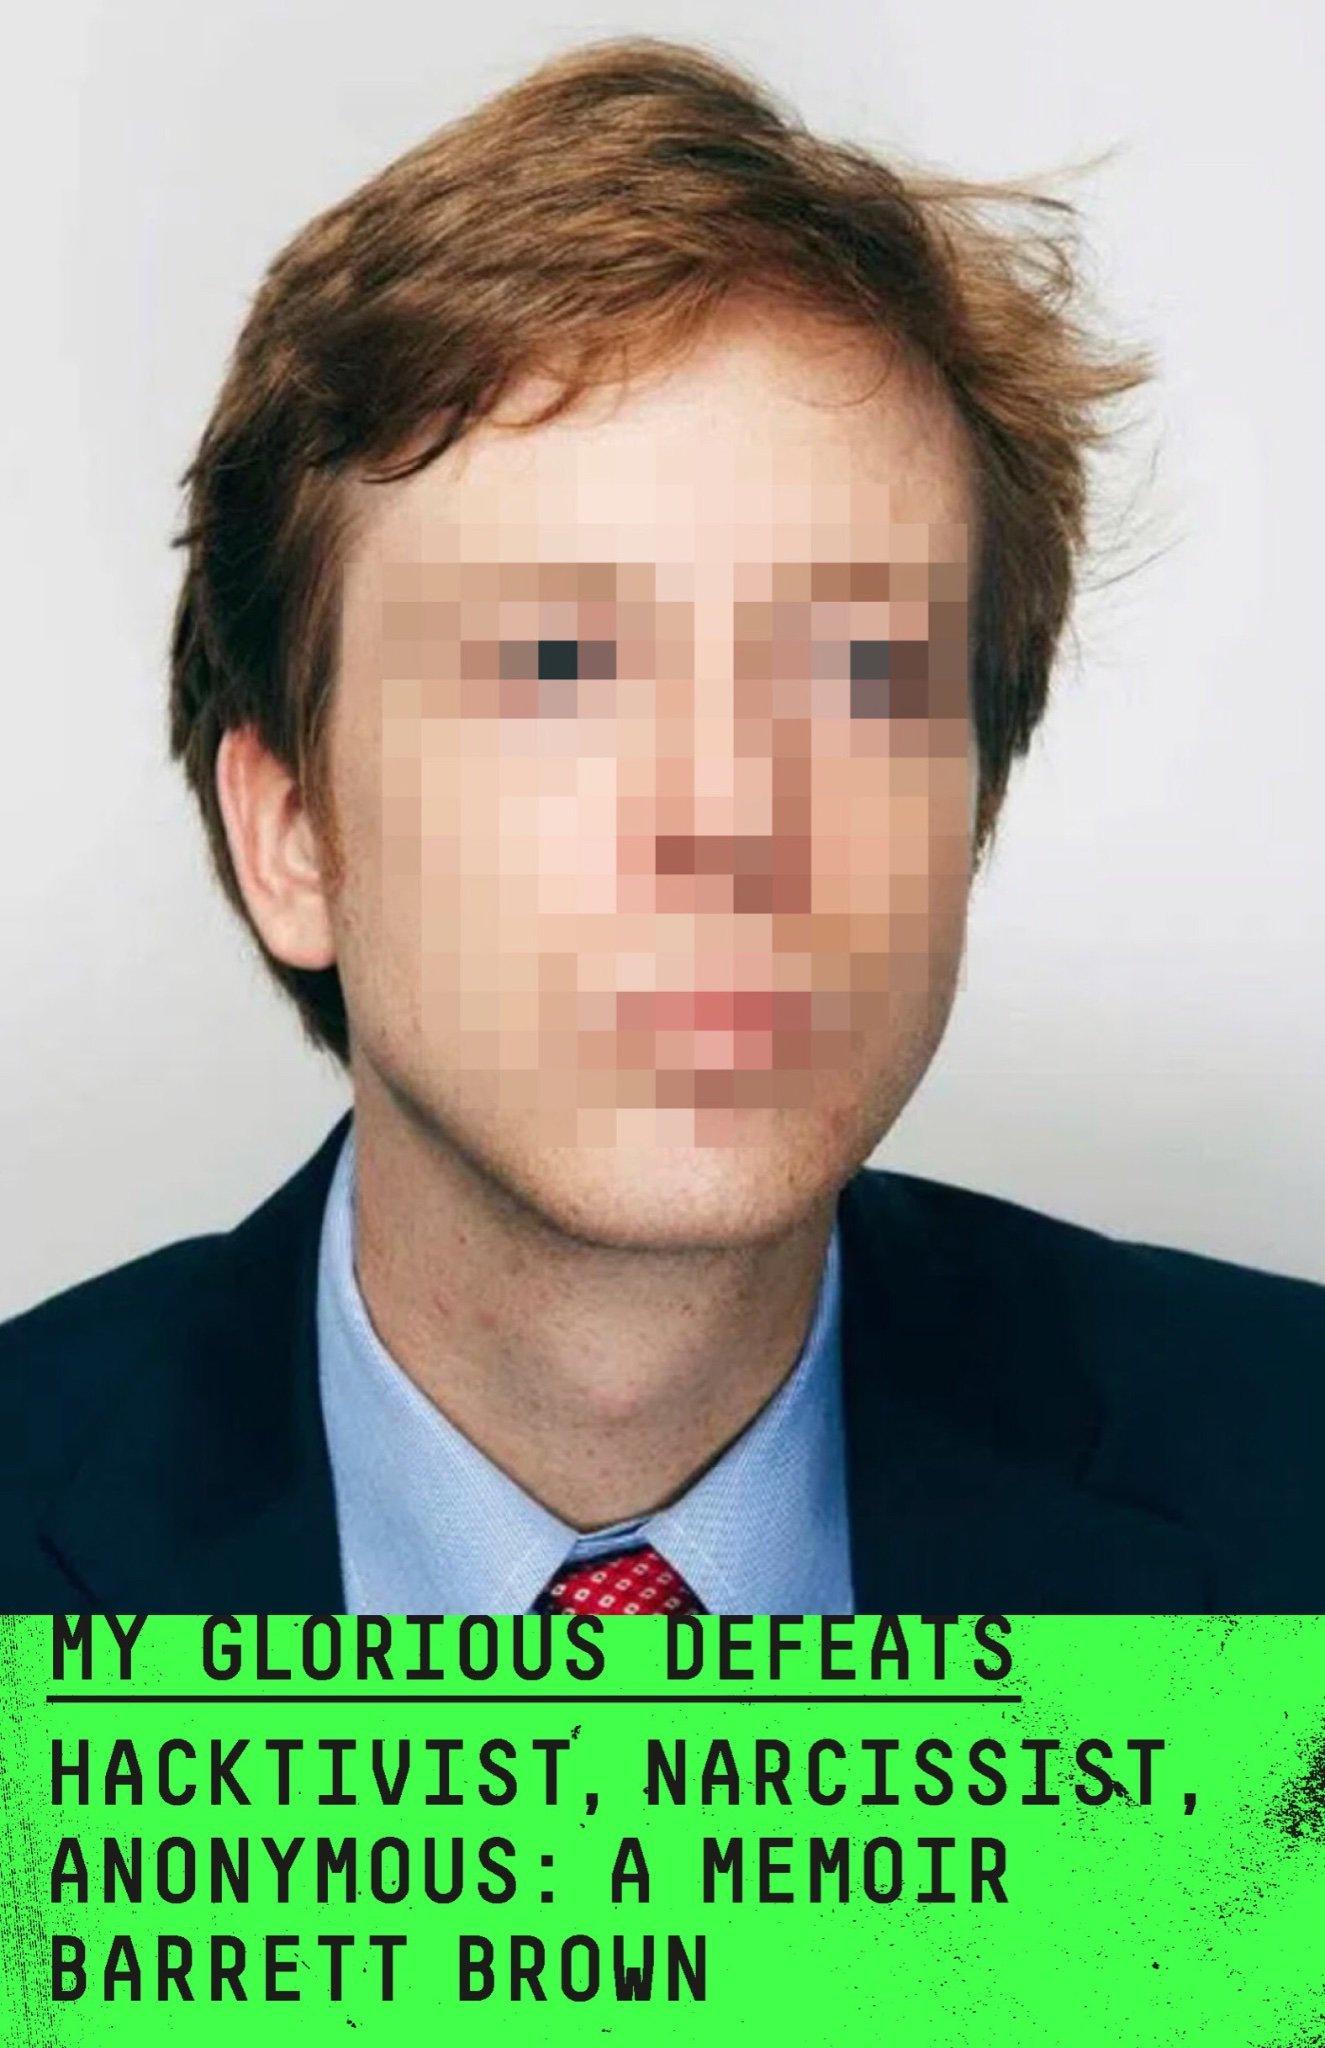 My Glorious Defeats: Hacktivist, Narcissist, Anonymous: A Memoir